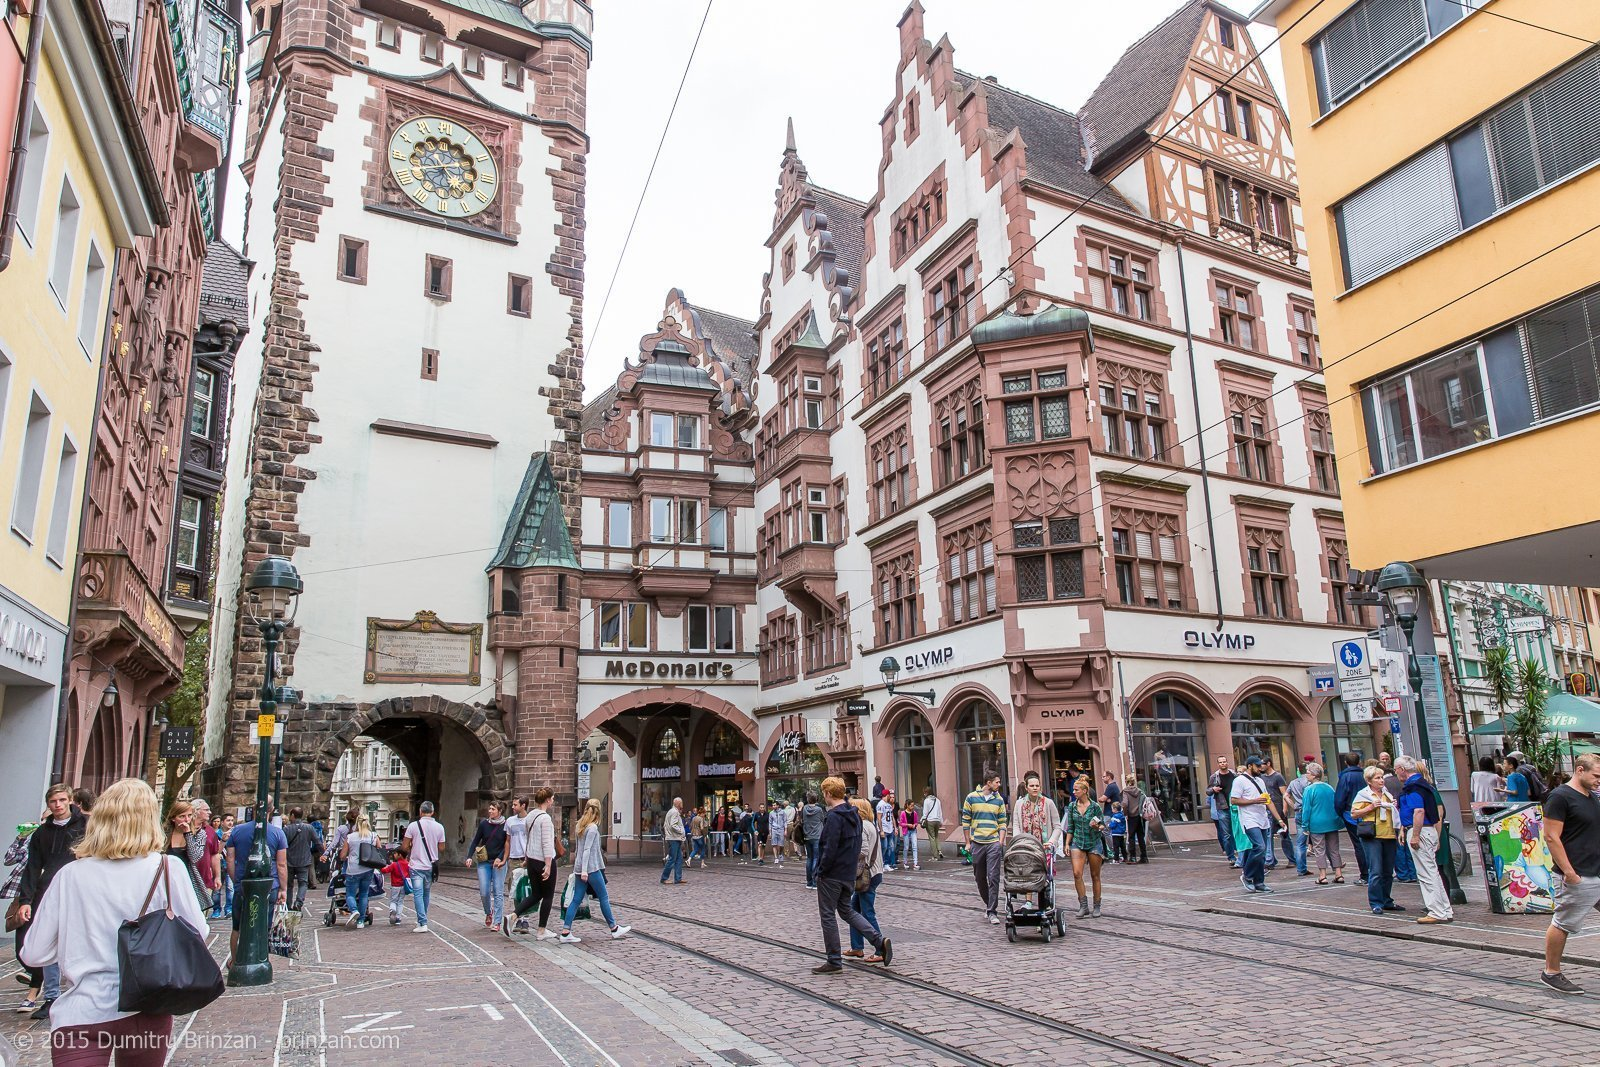 Freiburg im Breisgau Germany  city photo : Walk Around Freiburg im Breisgau, Germany August 2015